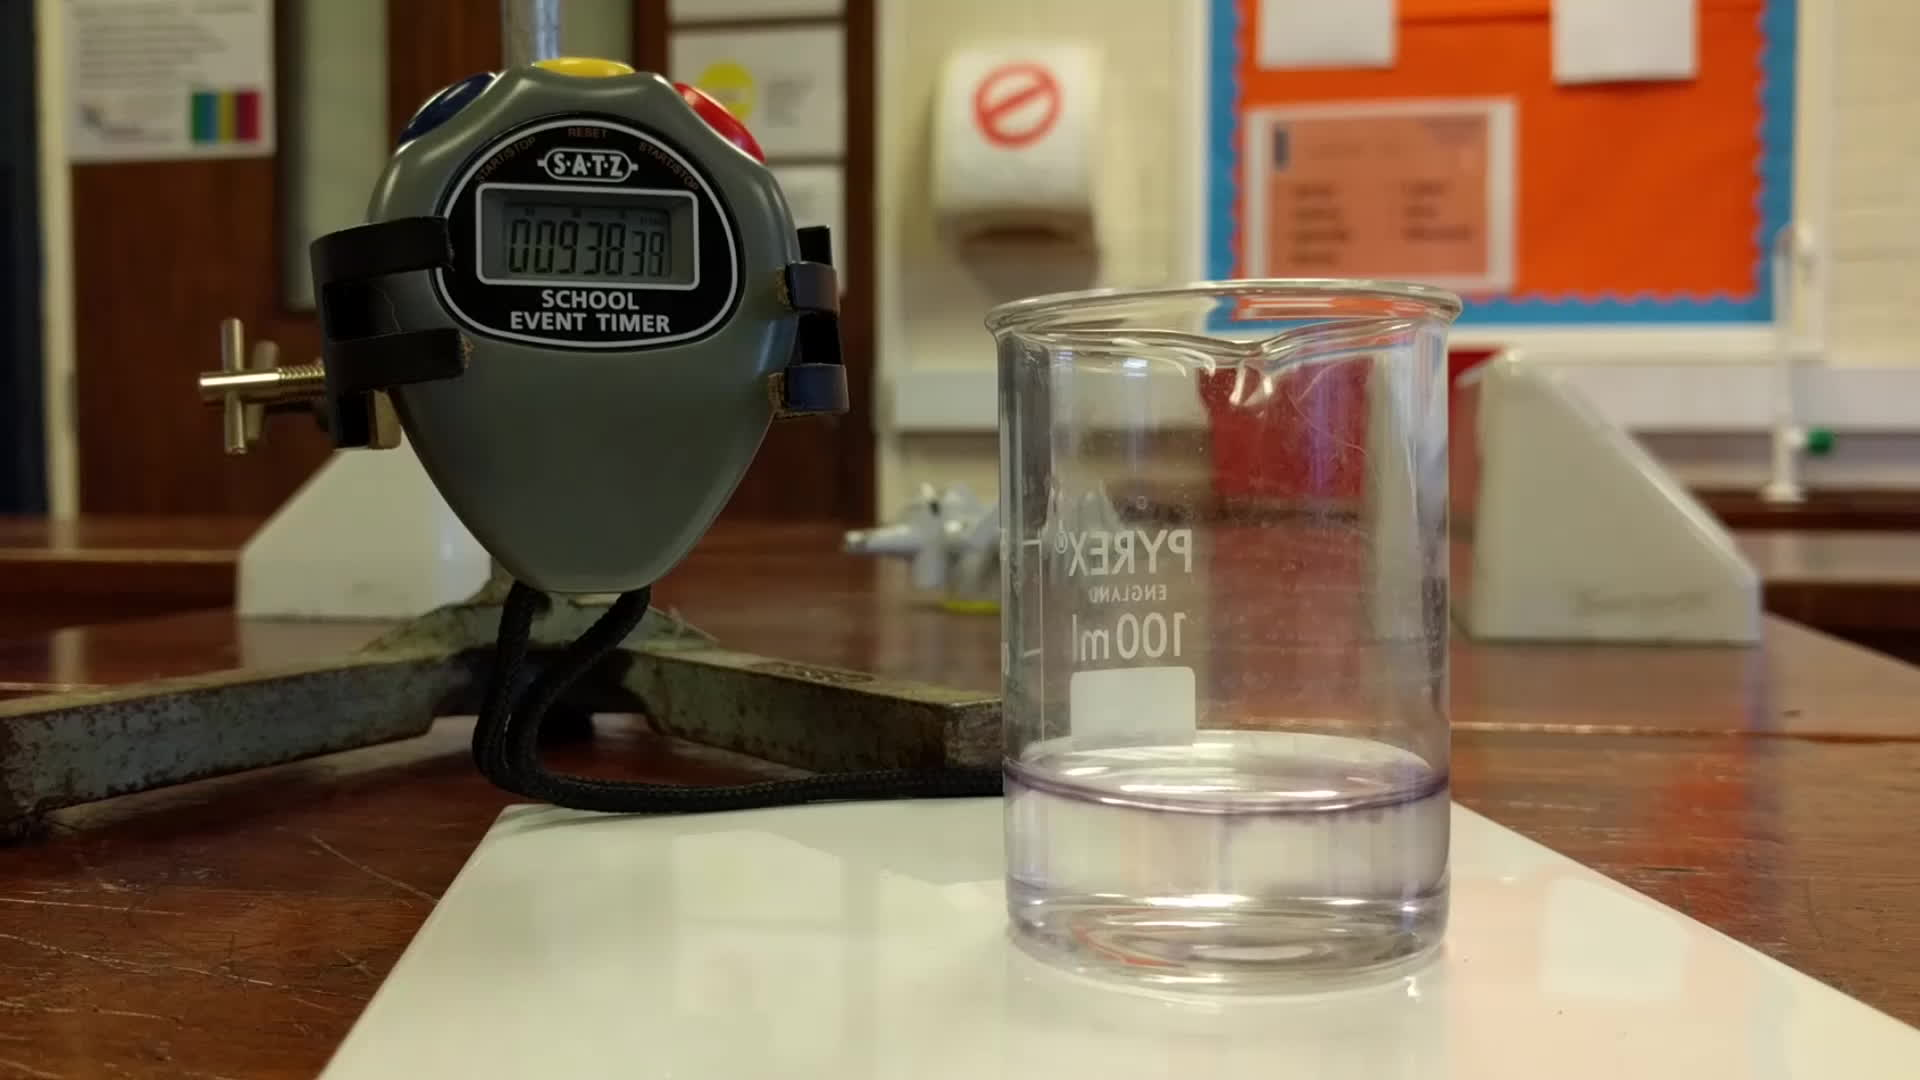 chemicalreactiongifs,  GIFs